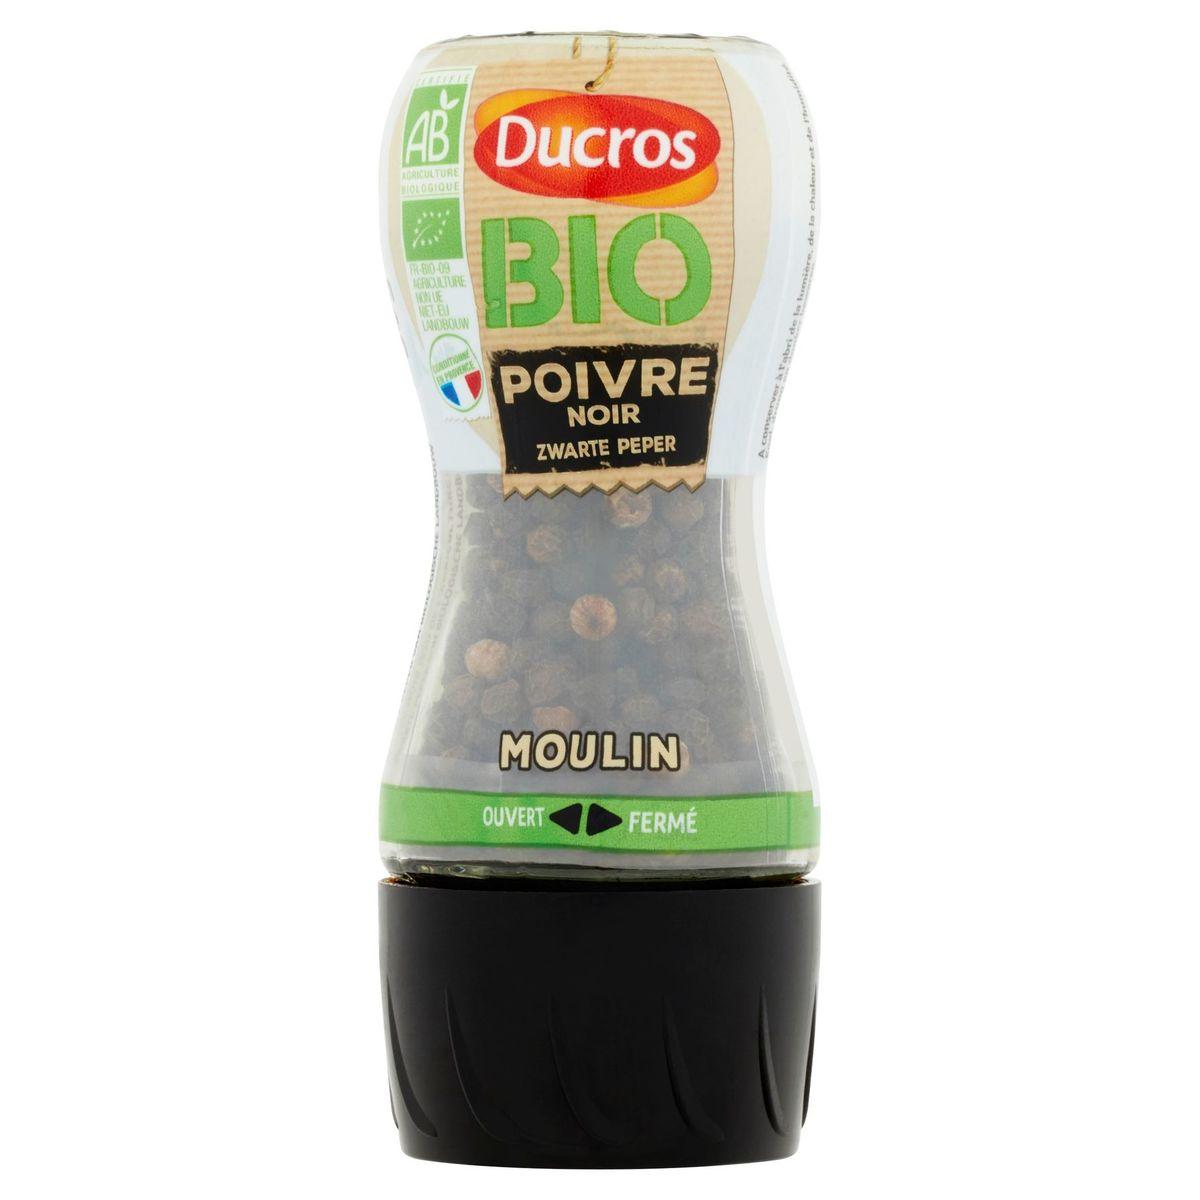 Ducros Bio Zwarte Peper Moulin 30 g